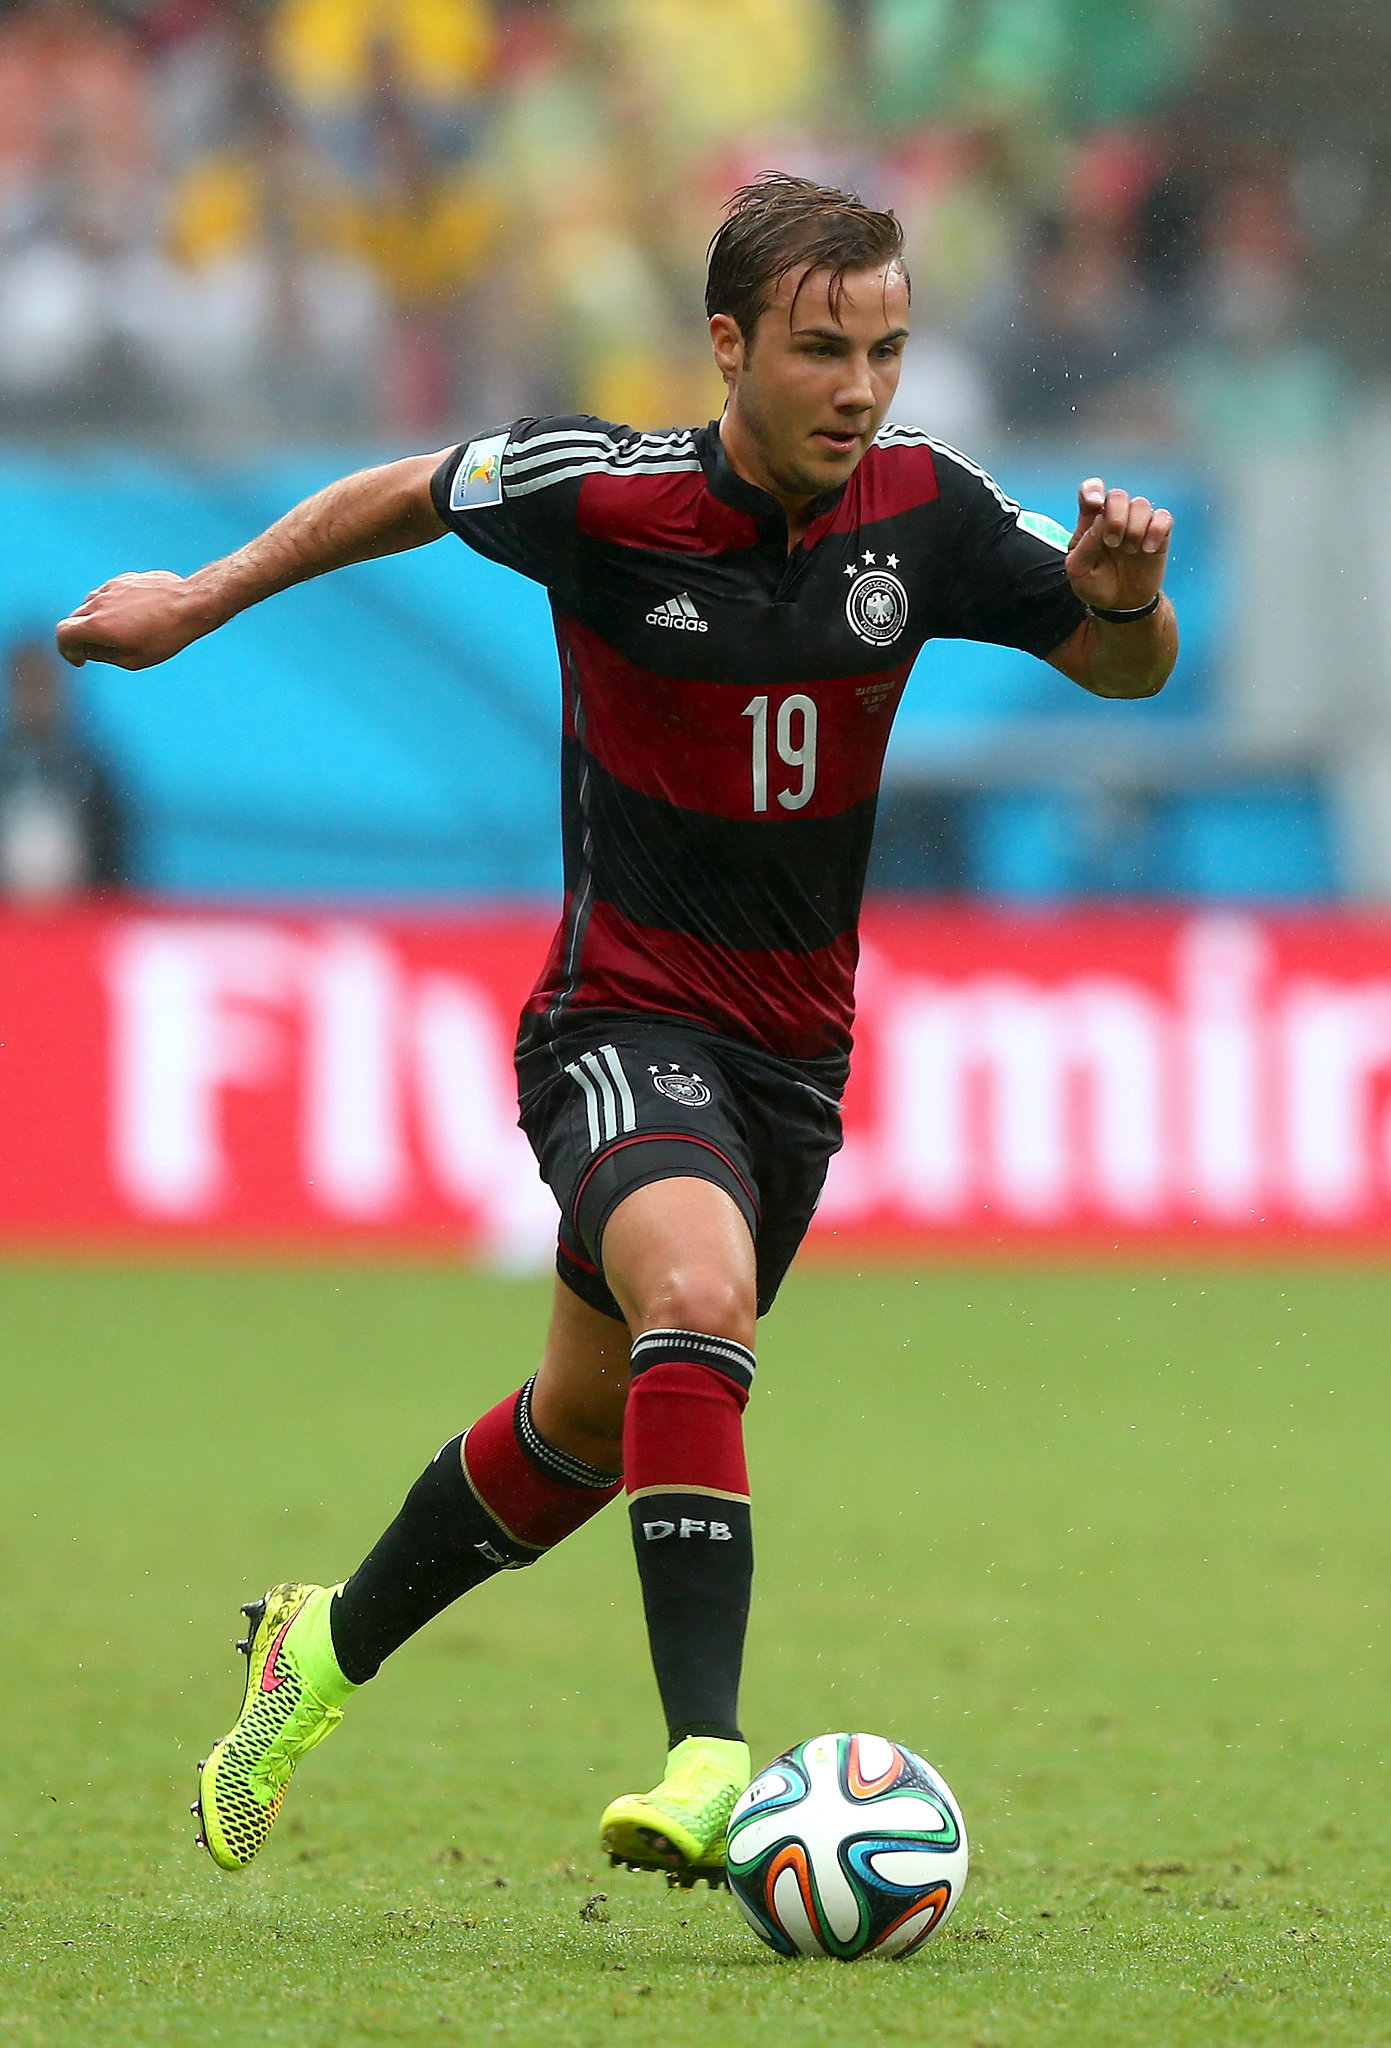 Mario Gotze to join Bayern Munich from Borussia Dortmund ... |Mario Gotze 2013 2014